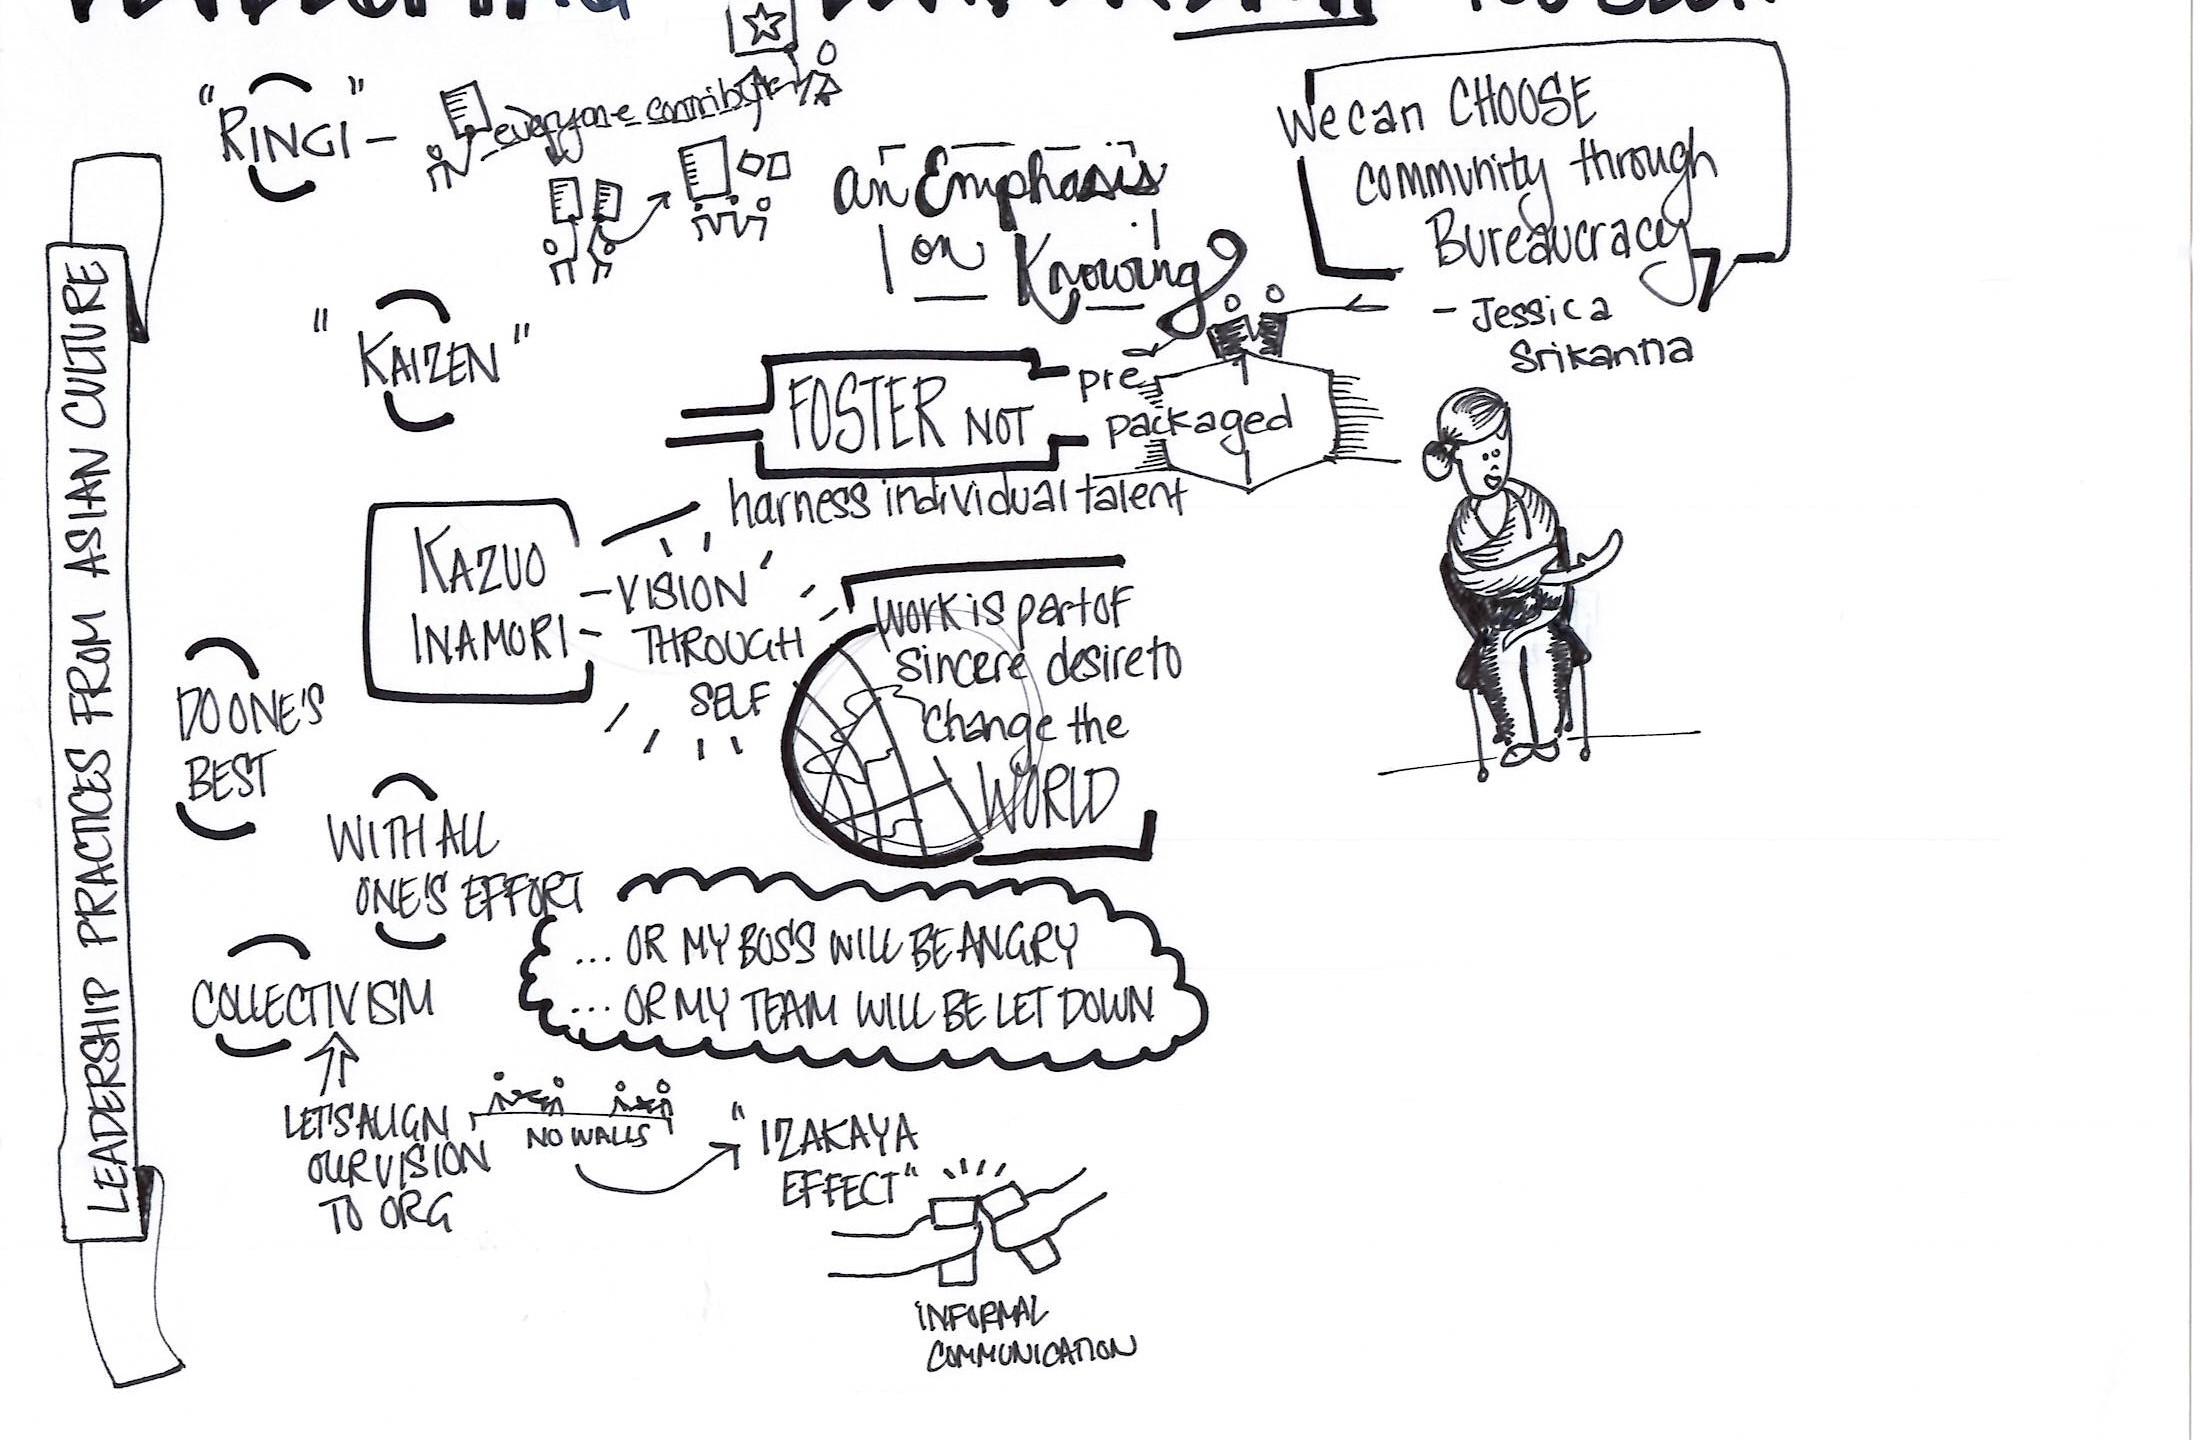 ODKM Learning Comminity_Sketchnotes_Danc